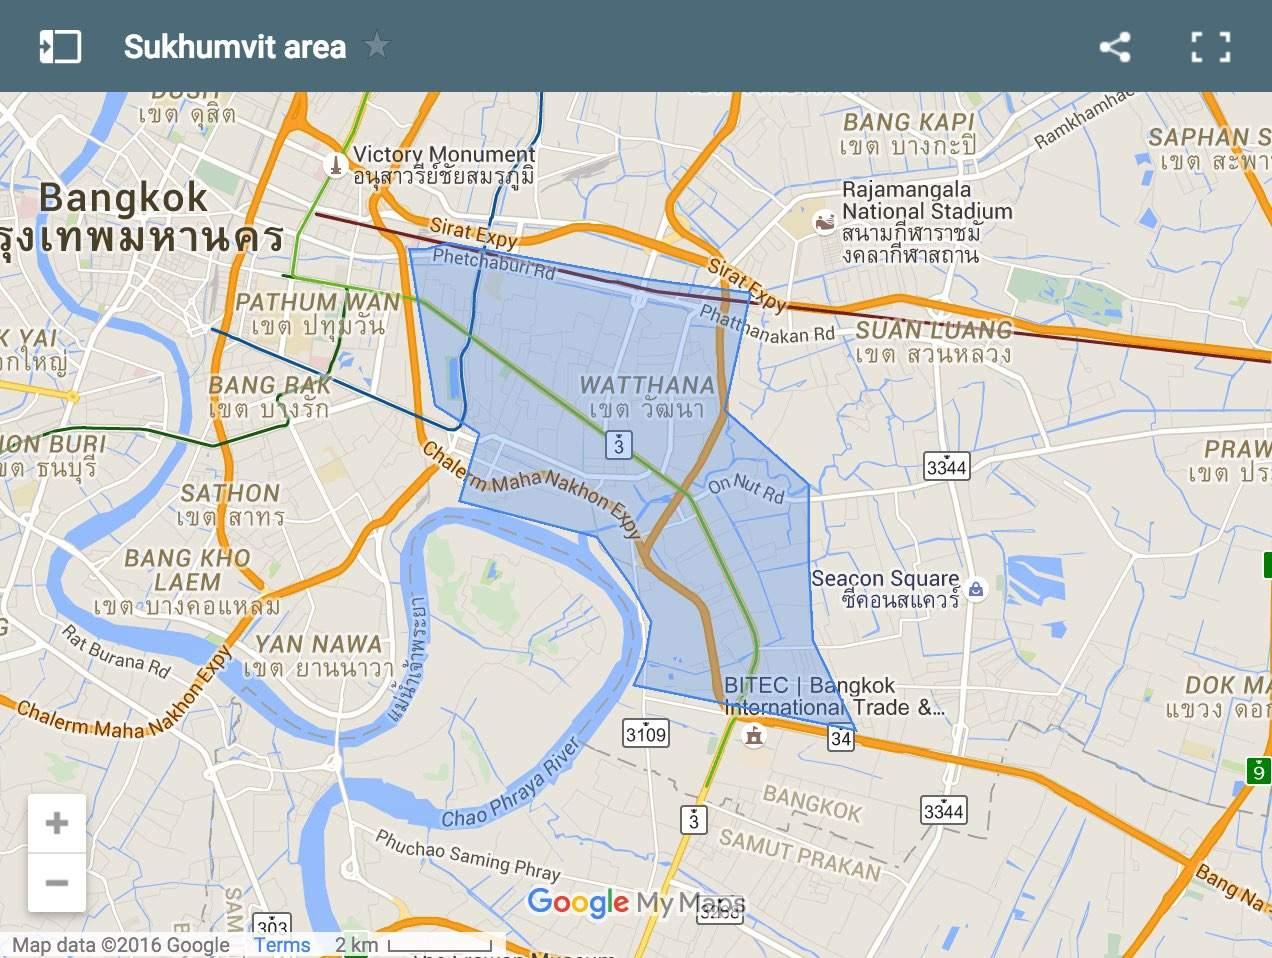 Sukhumvit map